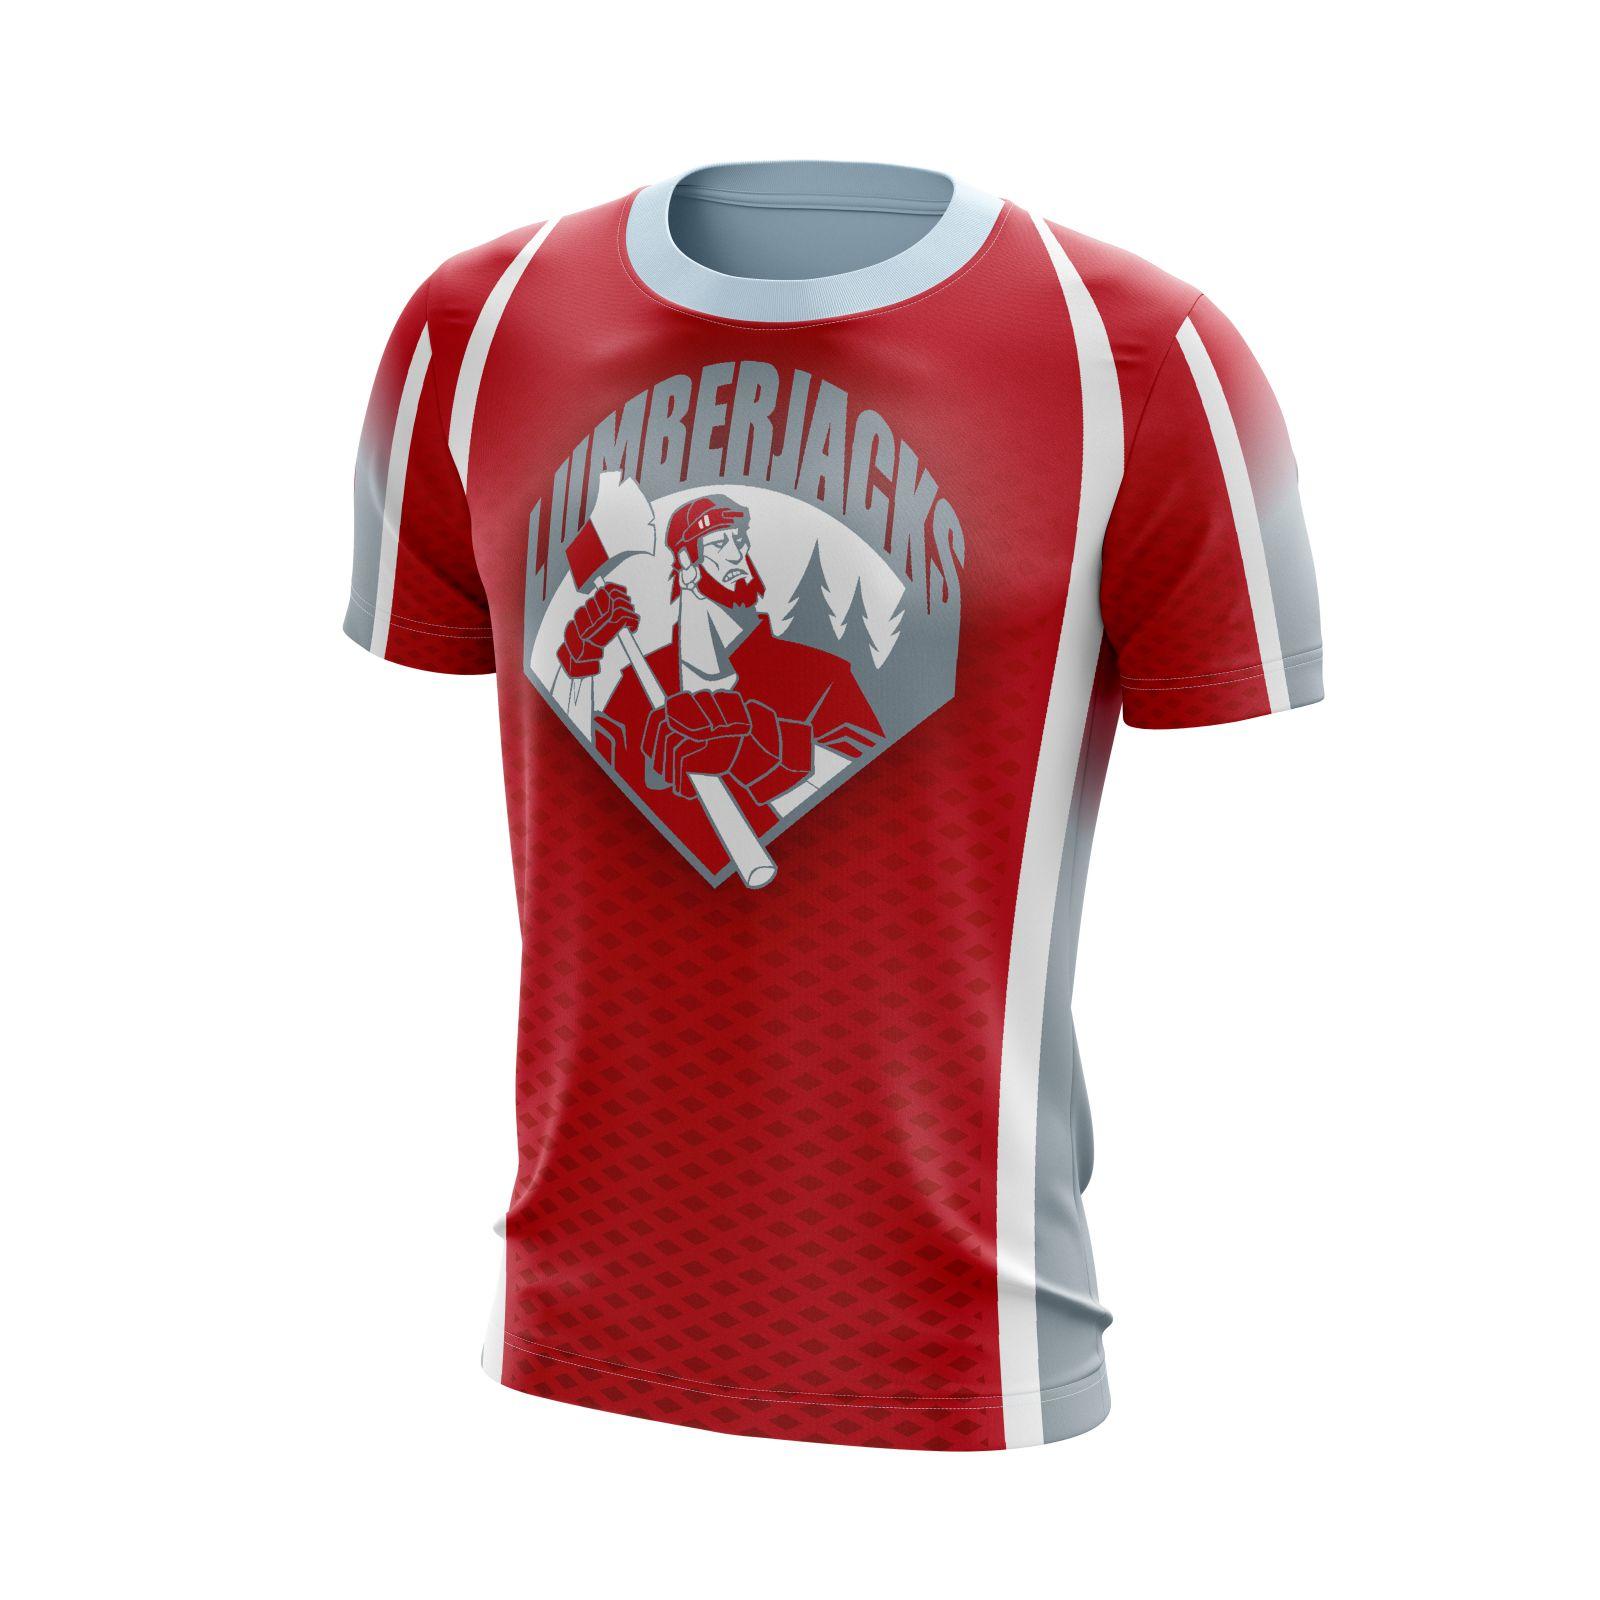 Saskatoon Team Sportswear T Shirts Amp Jerseys Slo Pitch